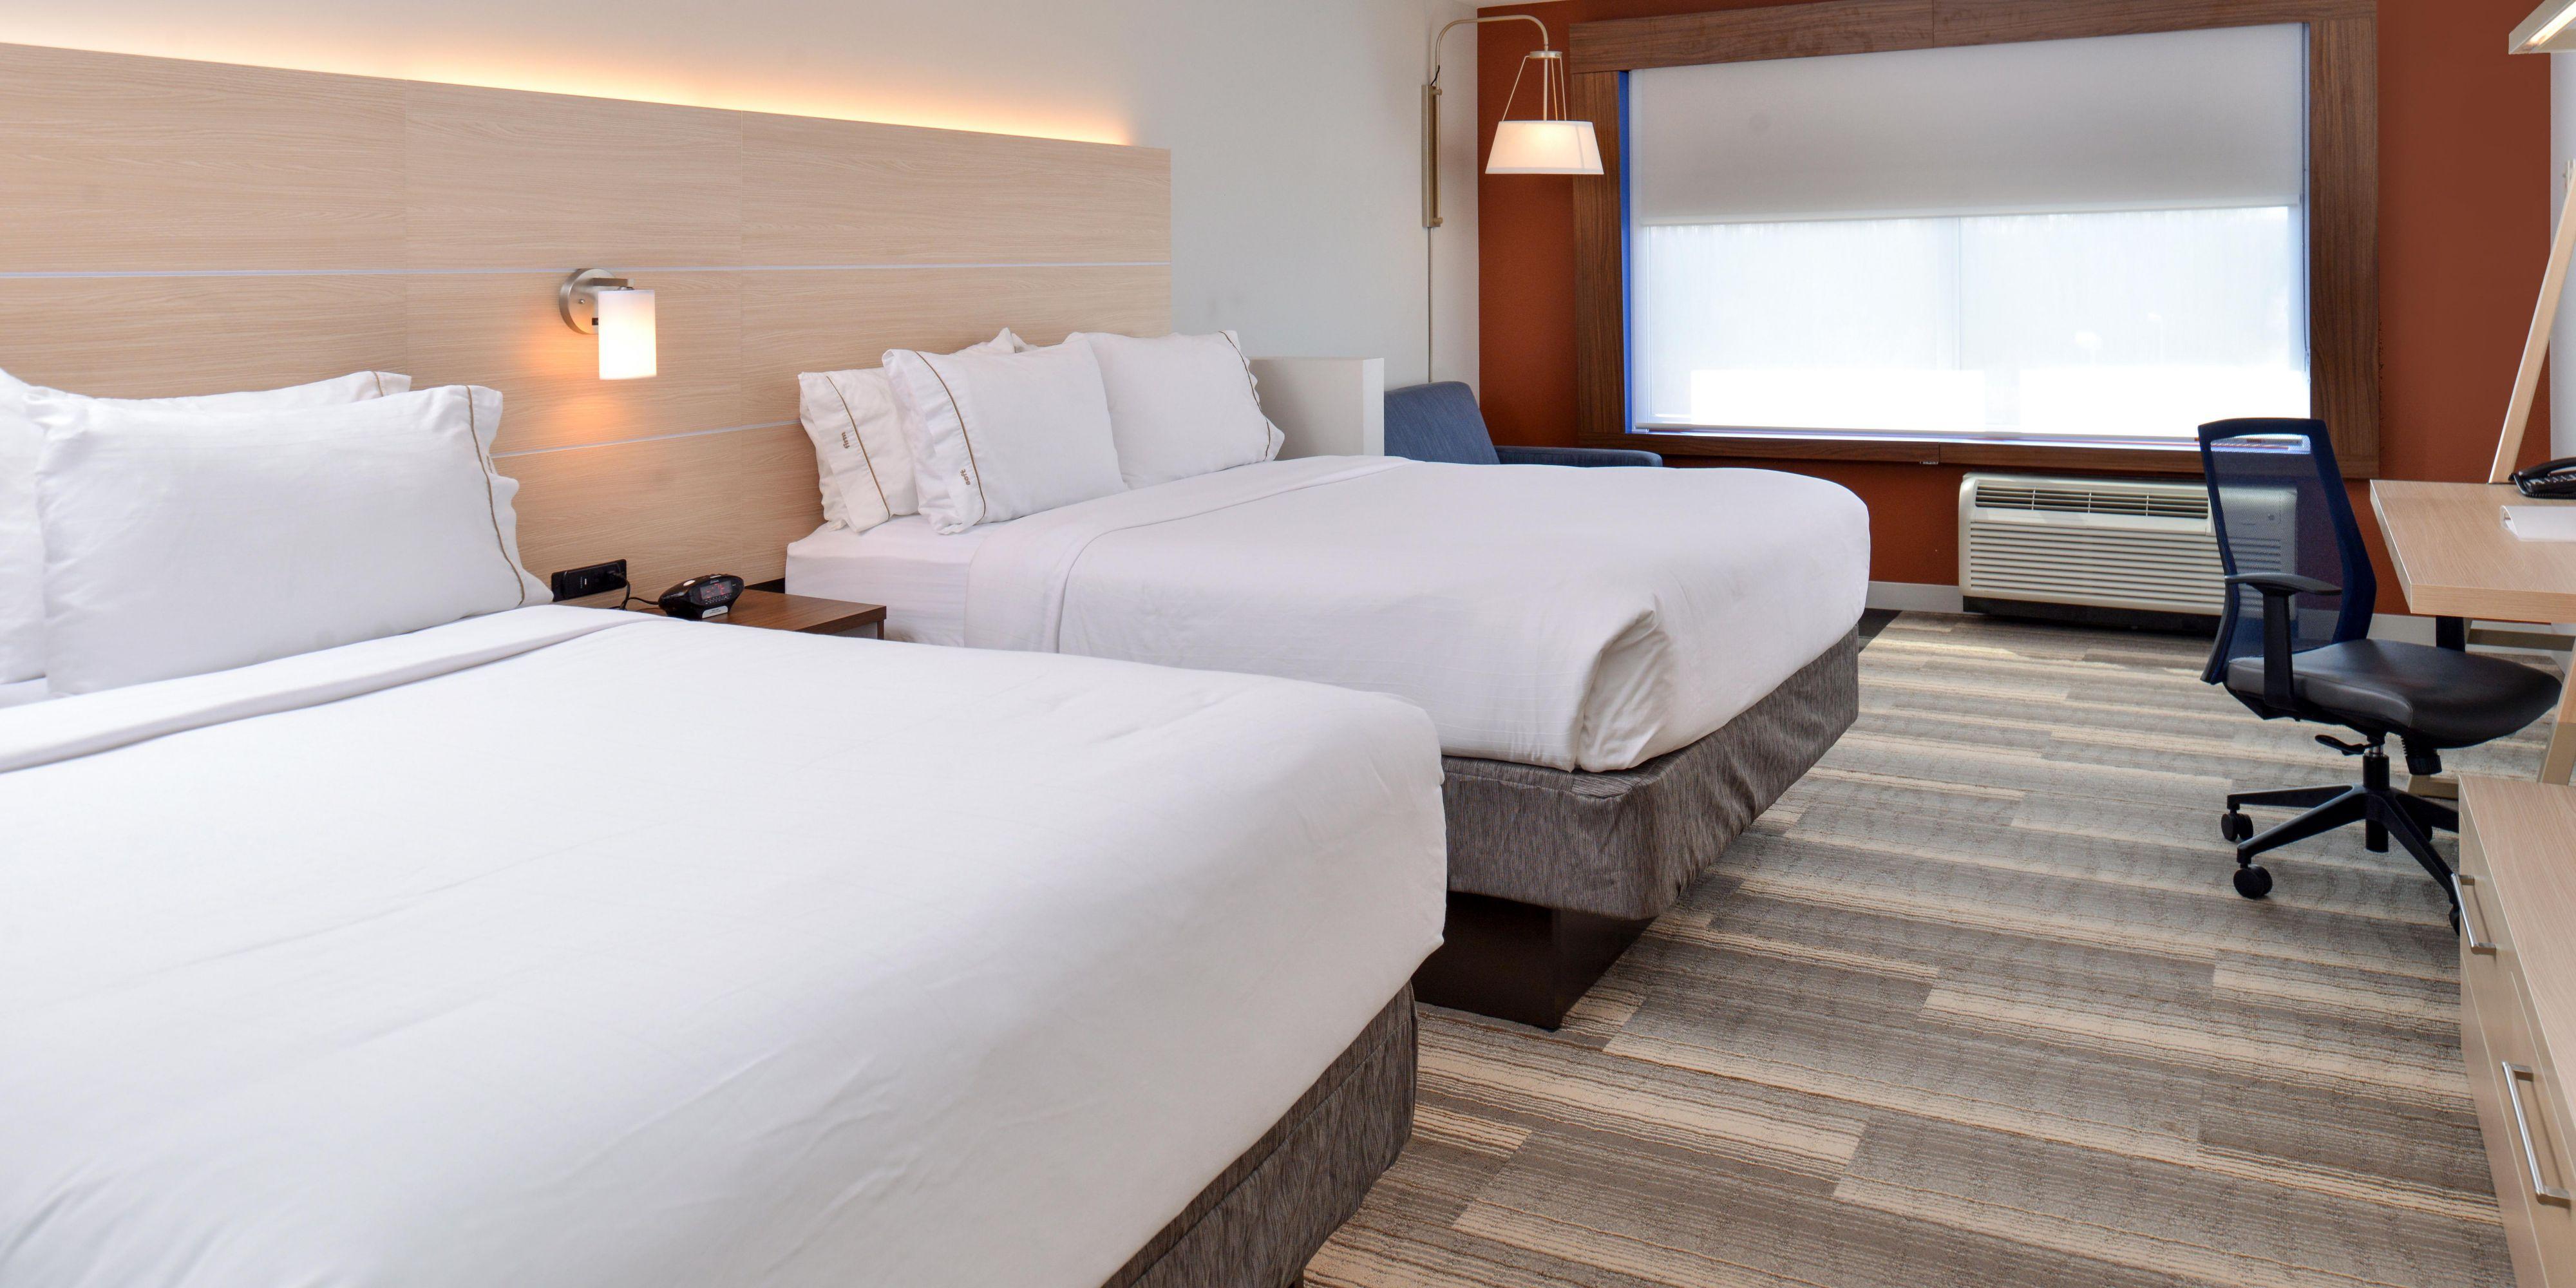 Holiday Inn Express & Suites Farmington Hills Detroit Hotel by IHG